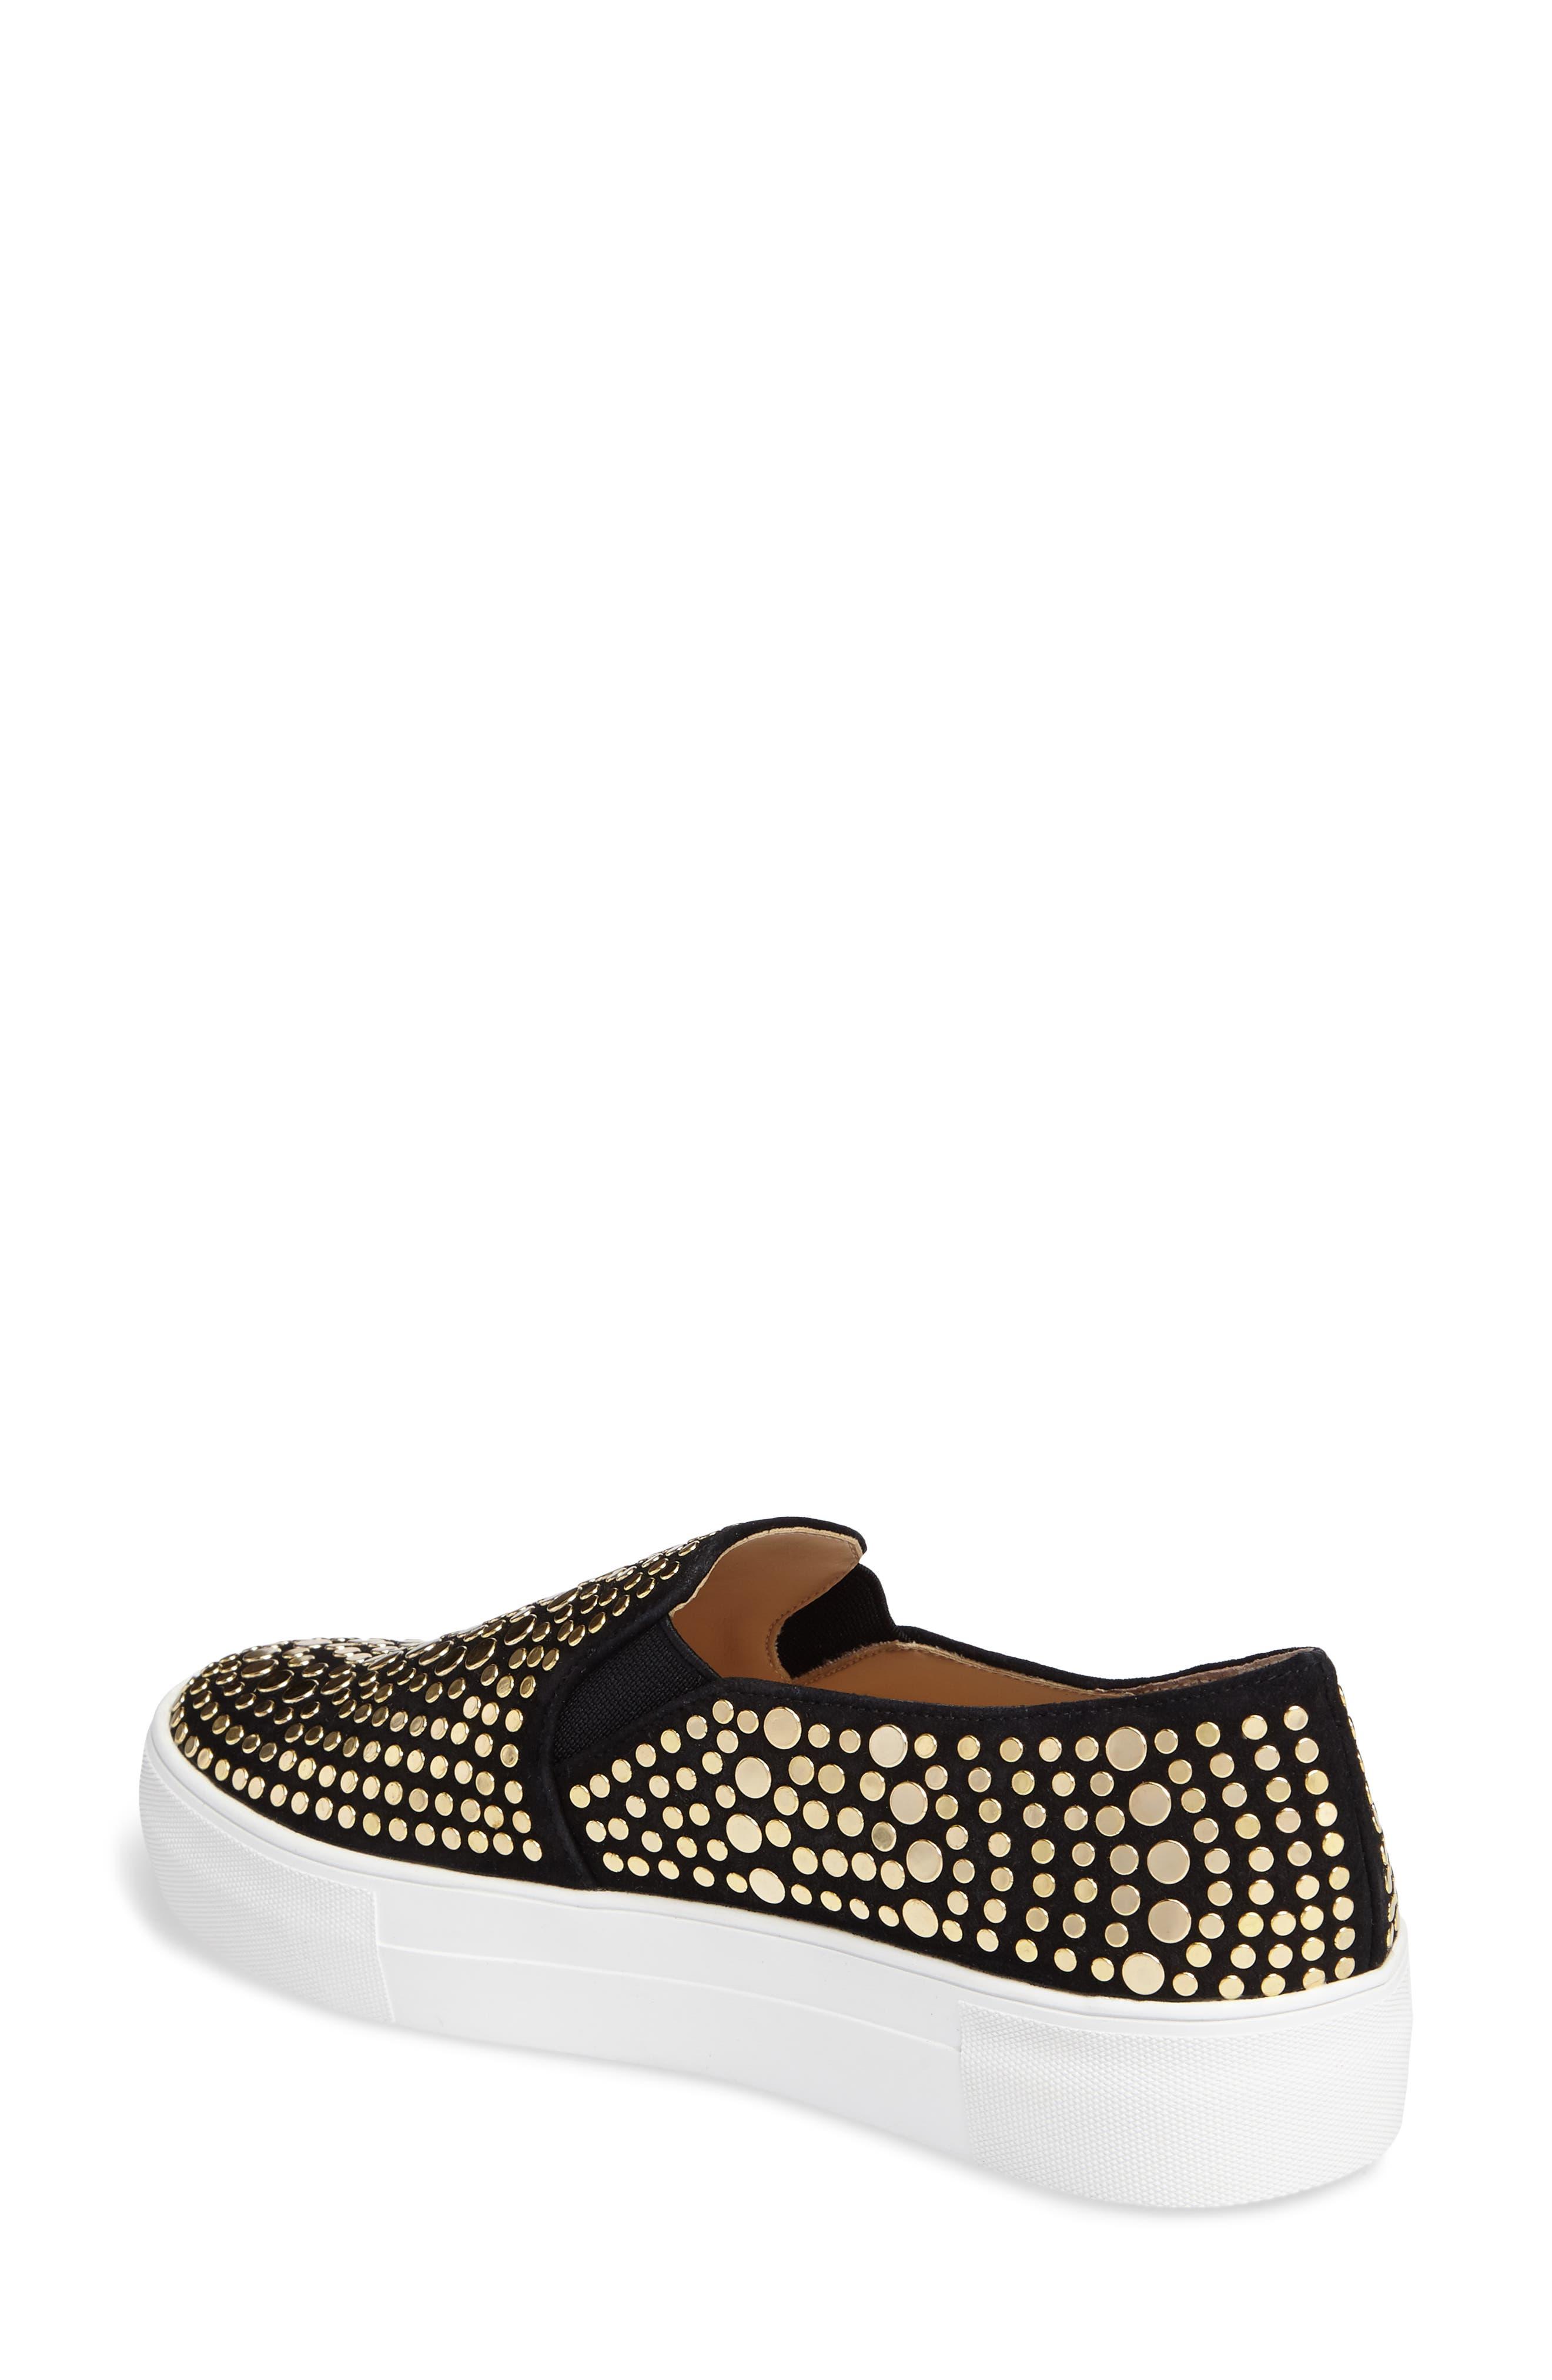 Alternate Image 2  - Vince Camuto Kindra Stud Slip-On Sneaker (Women)